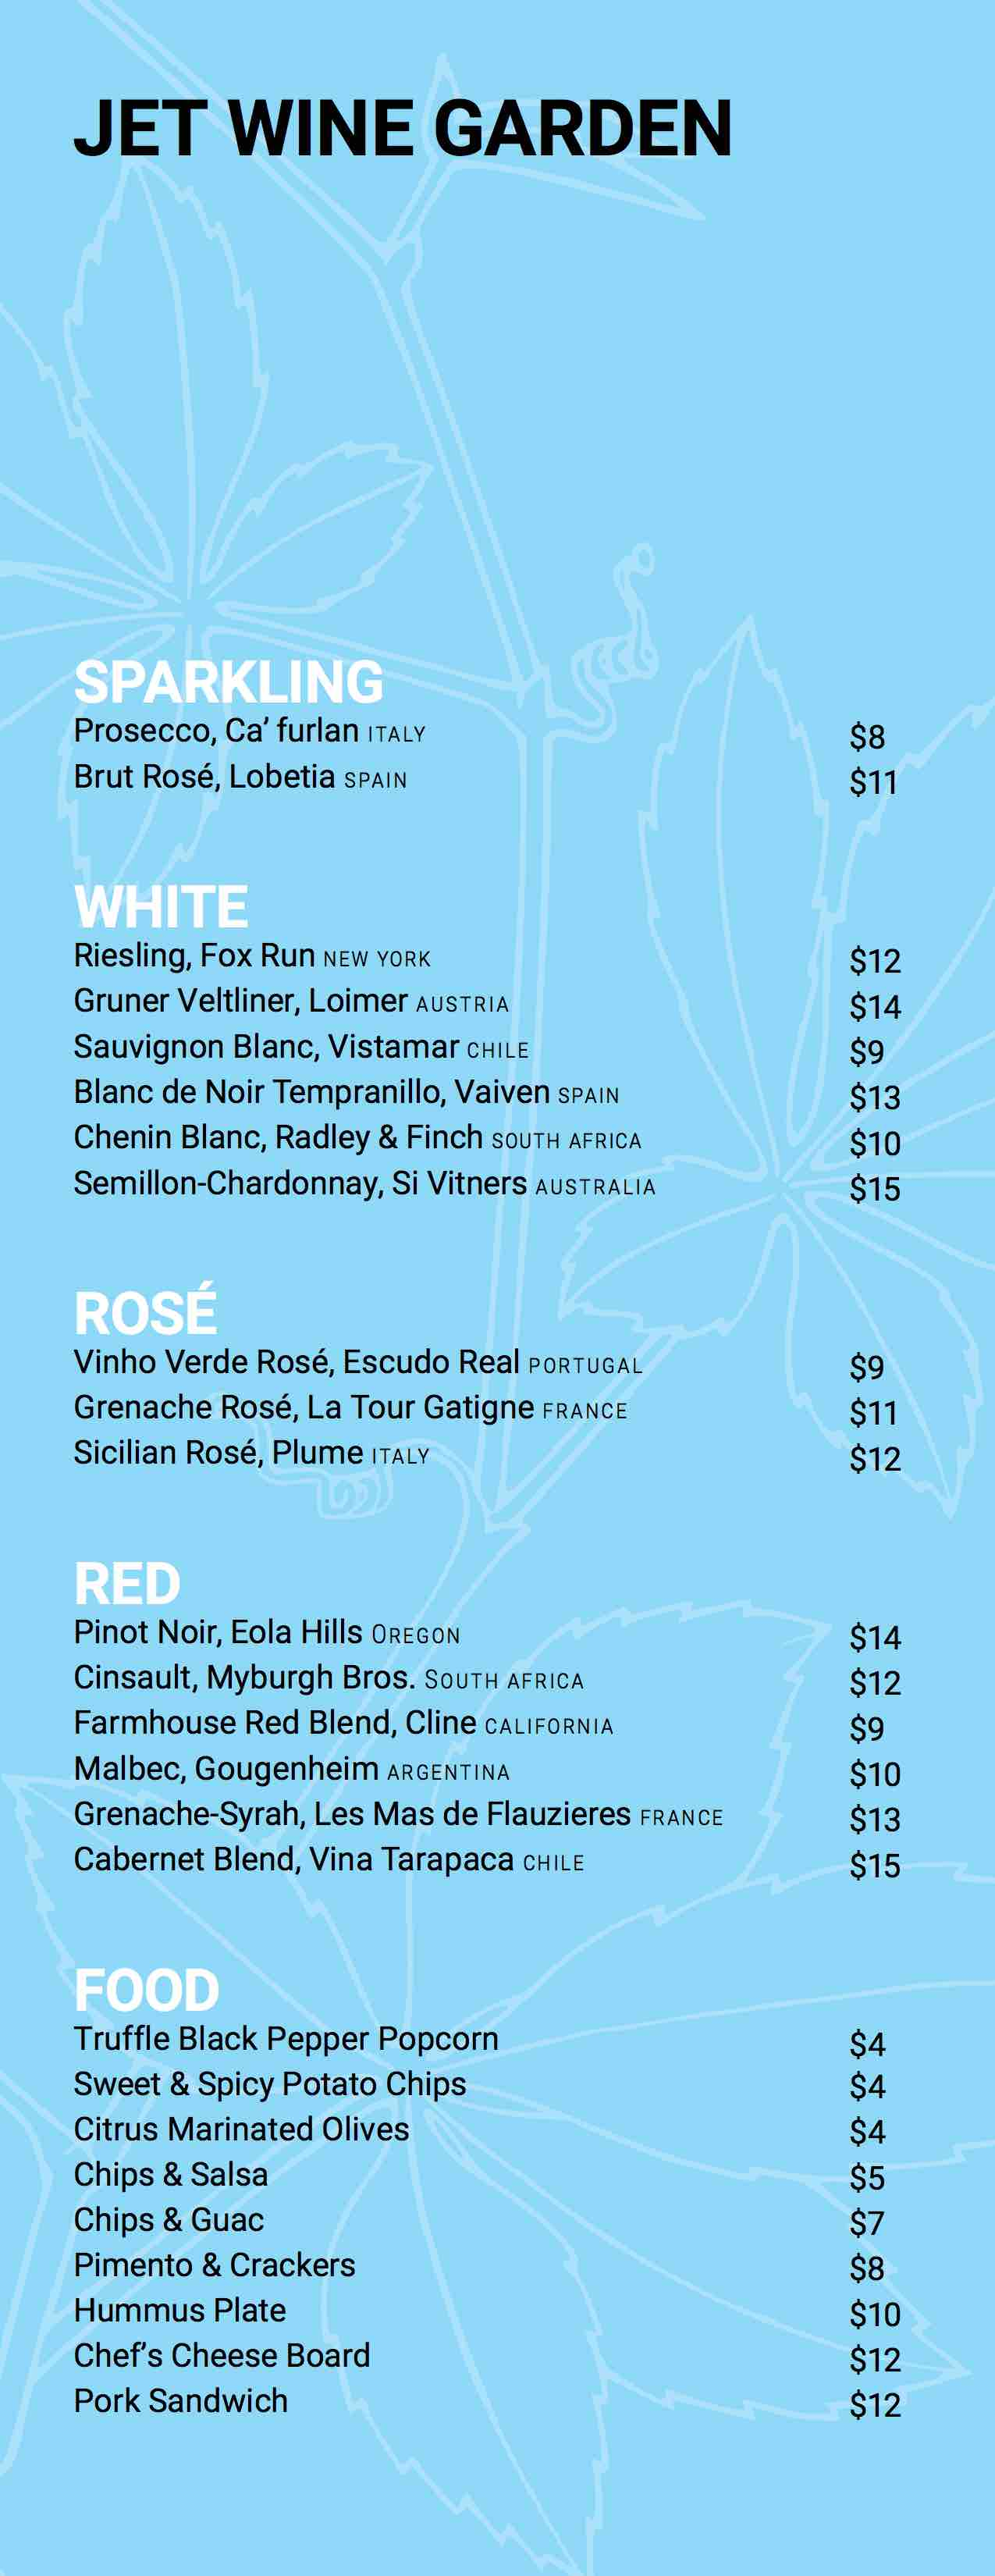 jet wine garden menu philadelpihia